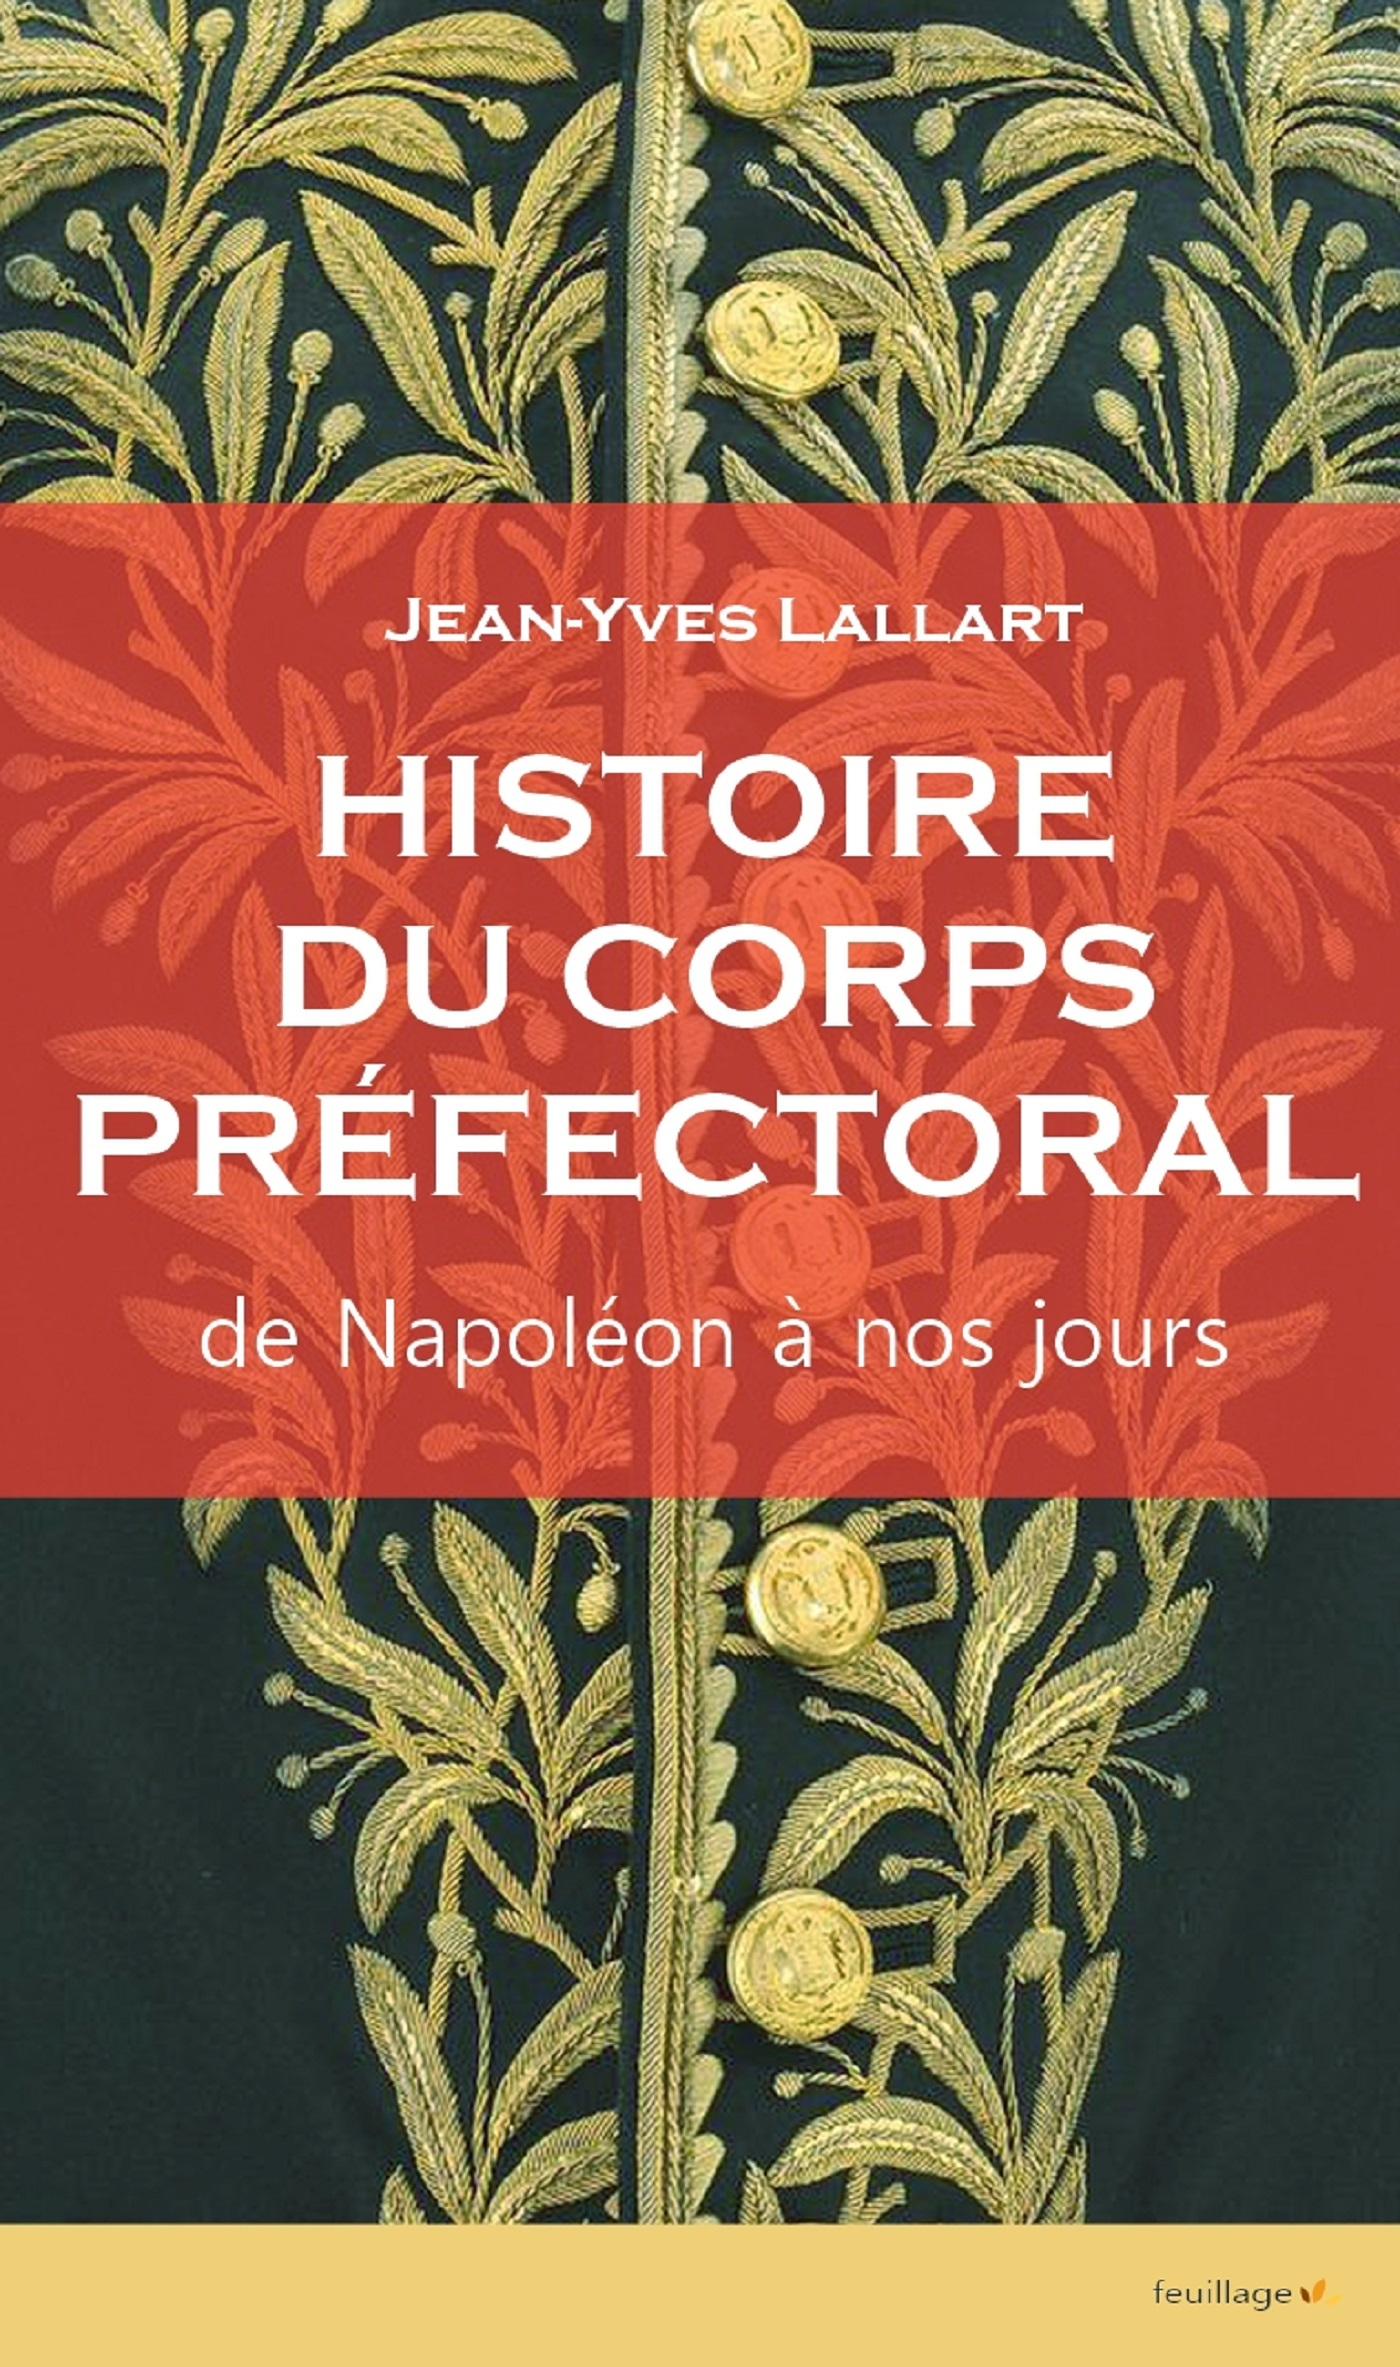 HISTOIRE DU CORPS PREFECTORAL